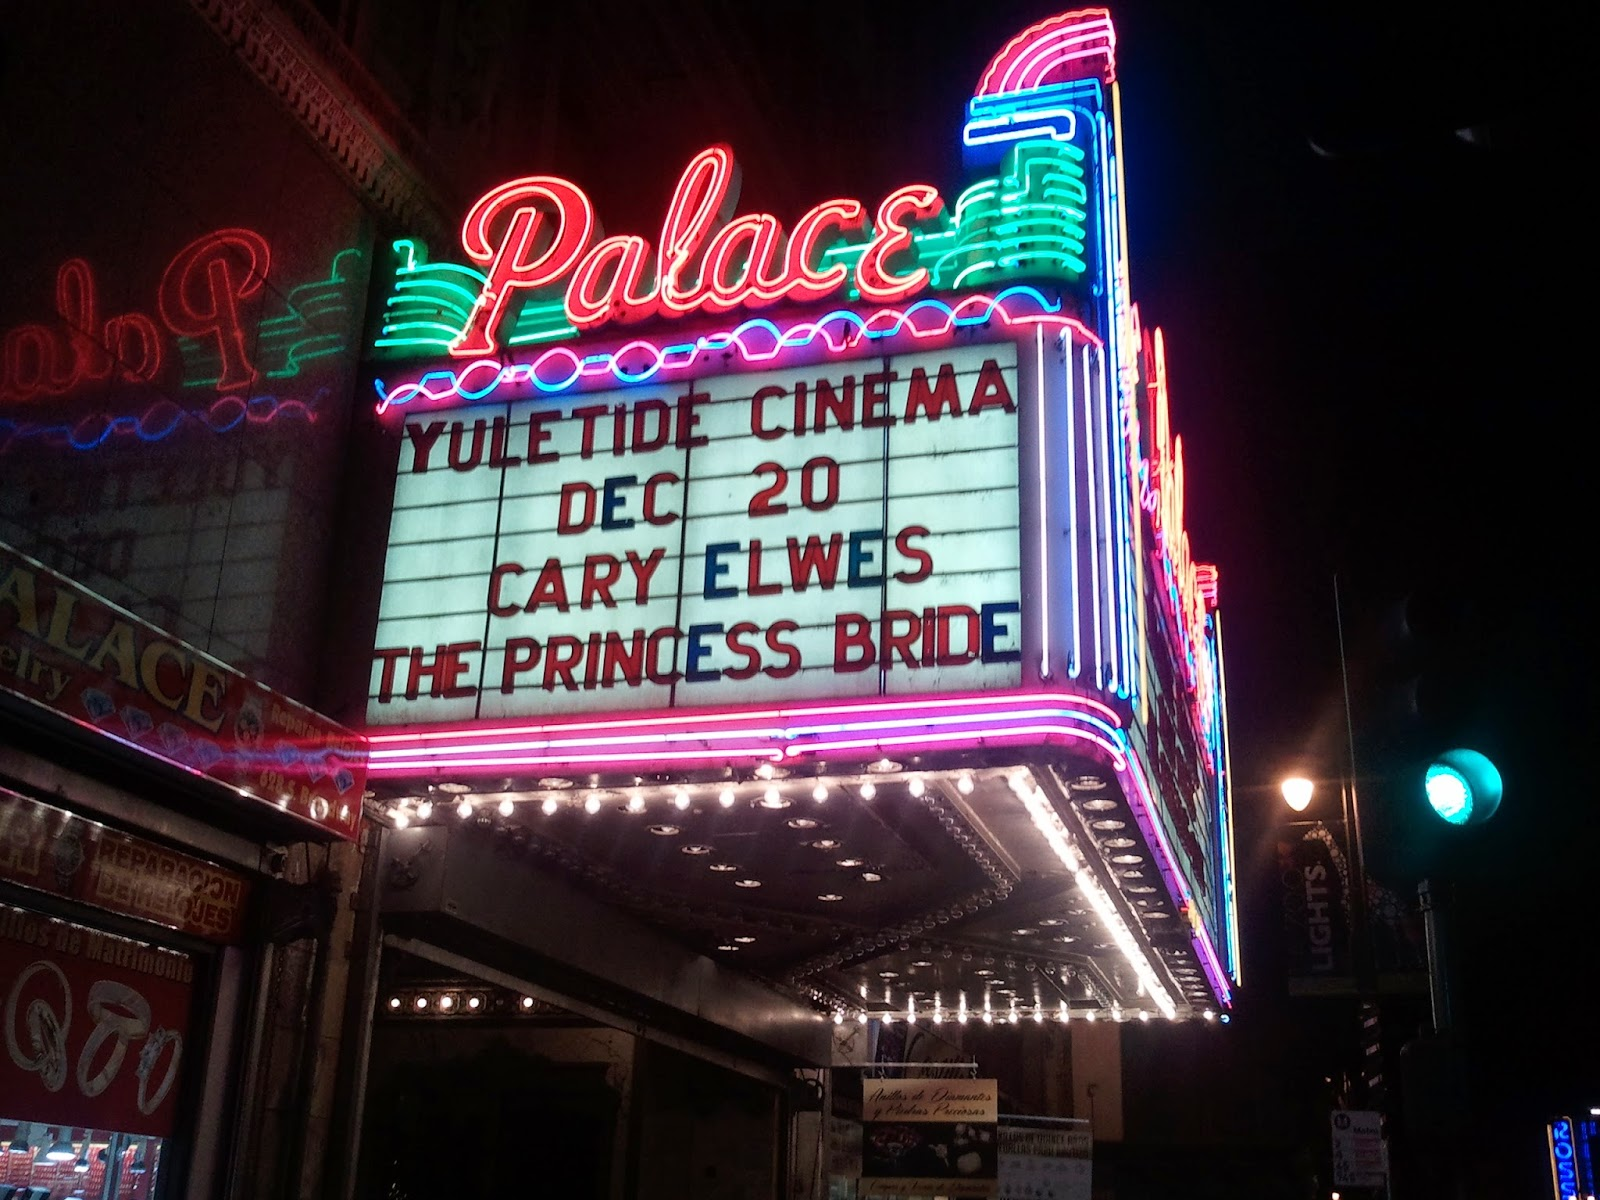 http://kirkhamclass.blogspot.com/2014/12/as-you-wish-evening-with-cary-elwes.html